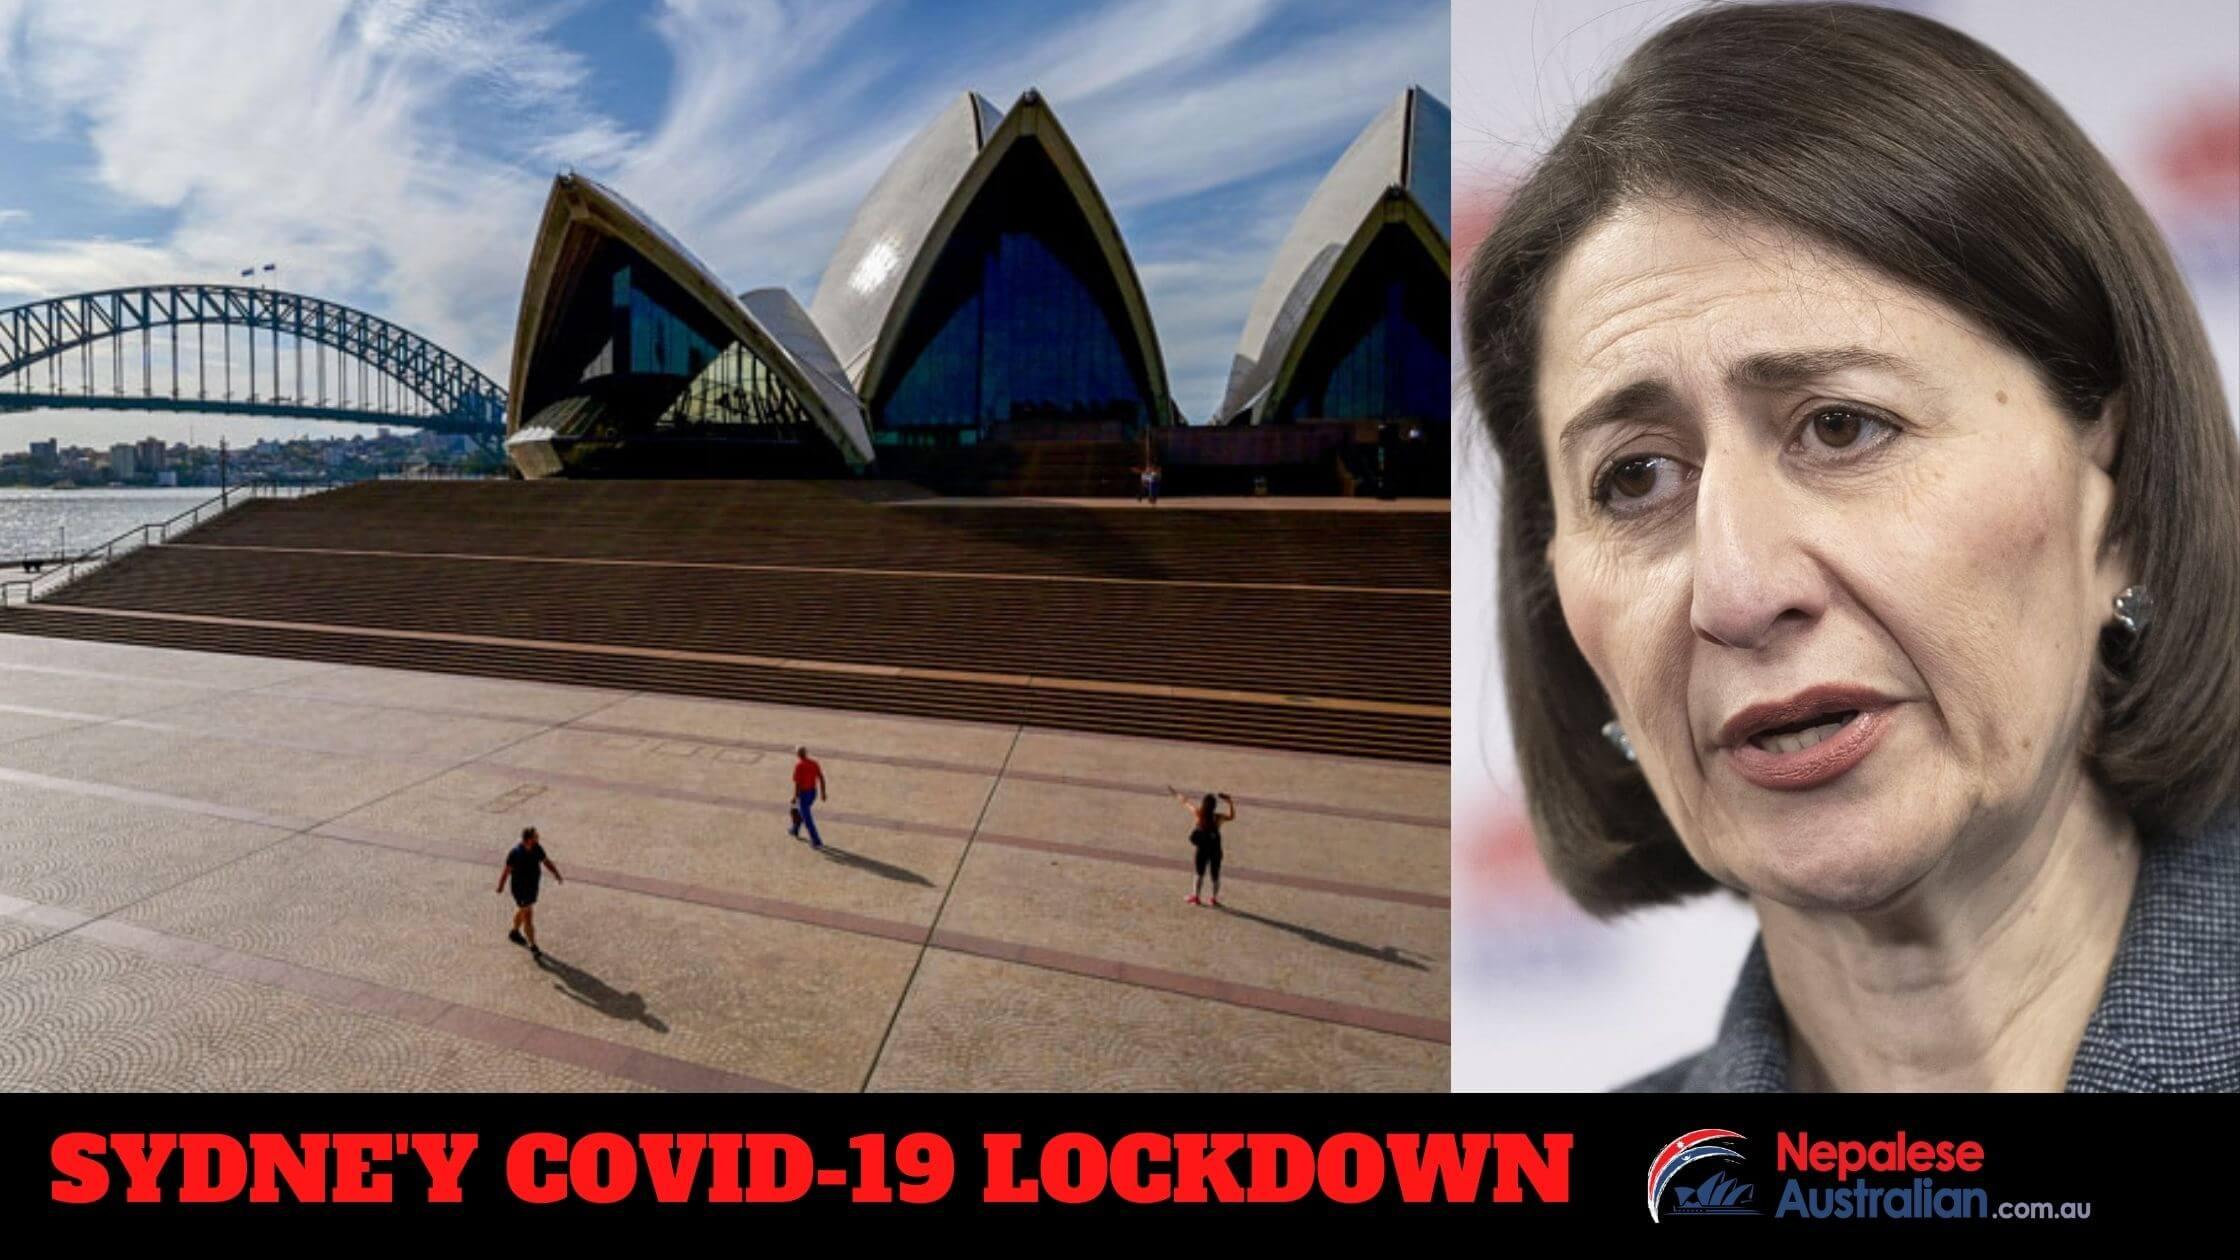 Sydney's Covid-19 Lockdown 2021 final